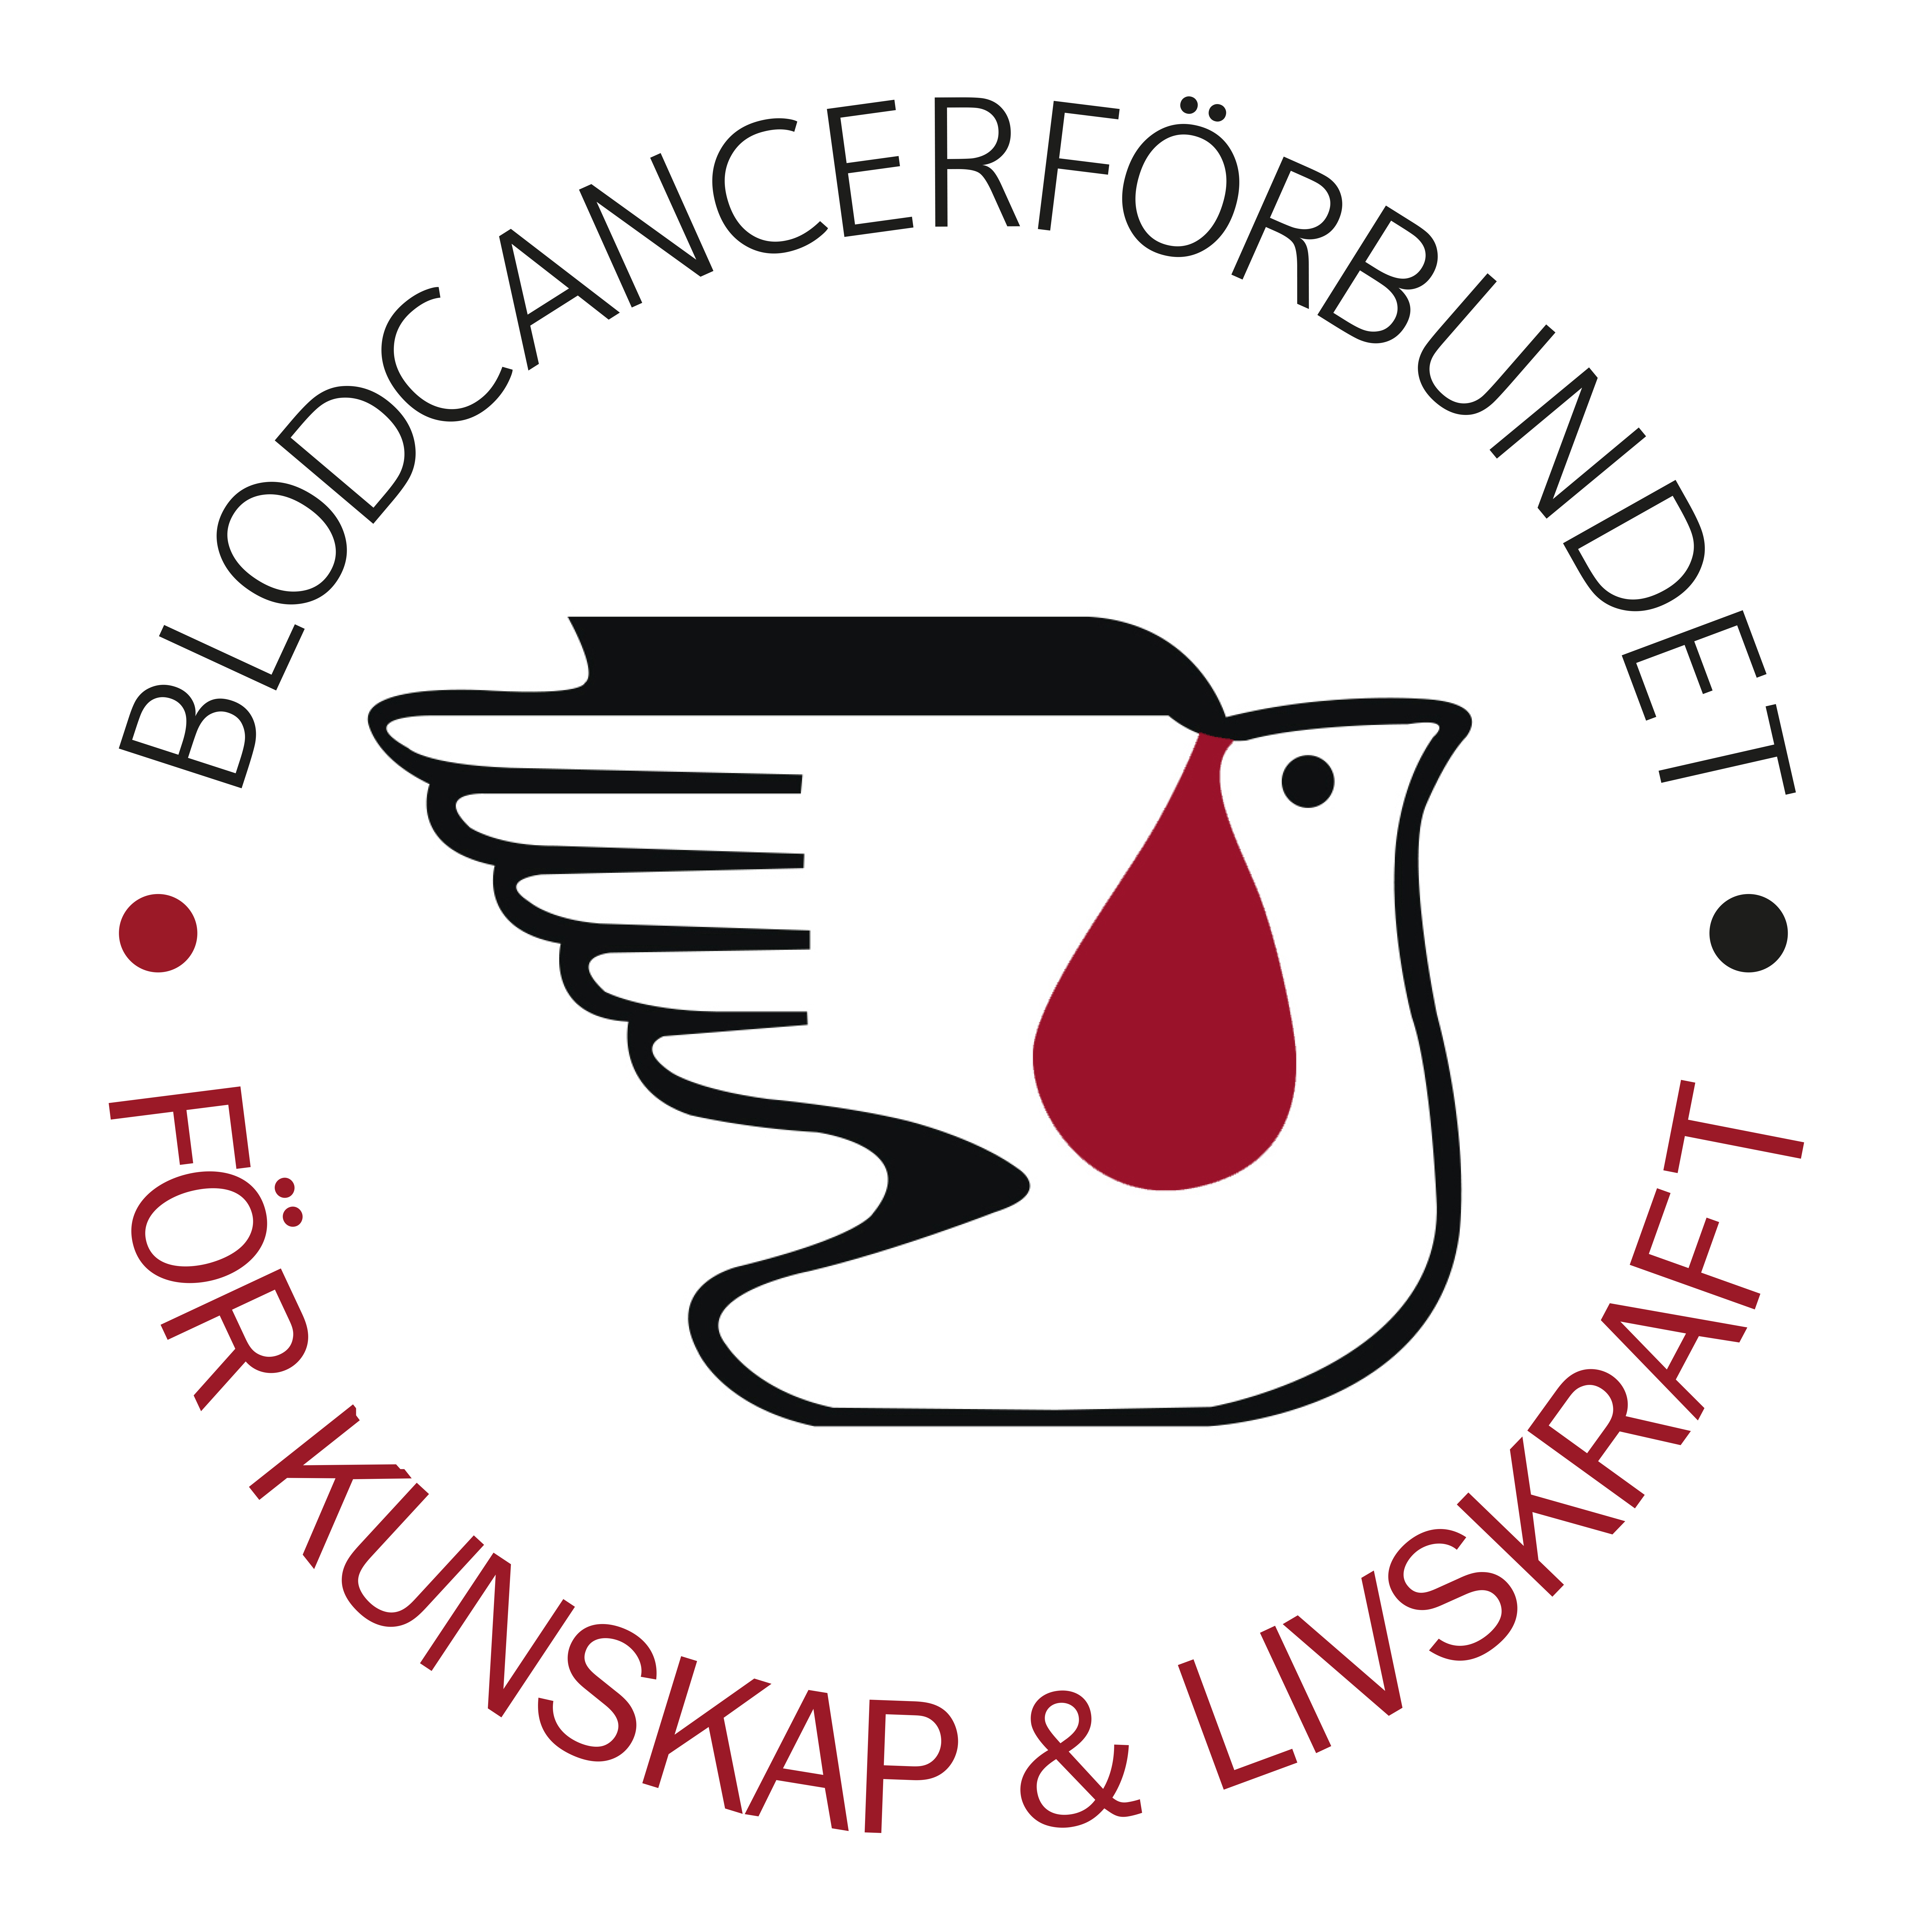 Blodcancerförbundet Logga Pantone 201